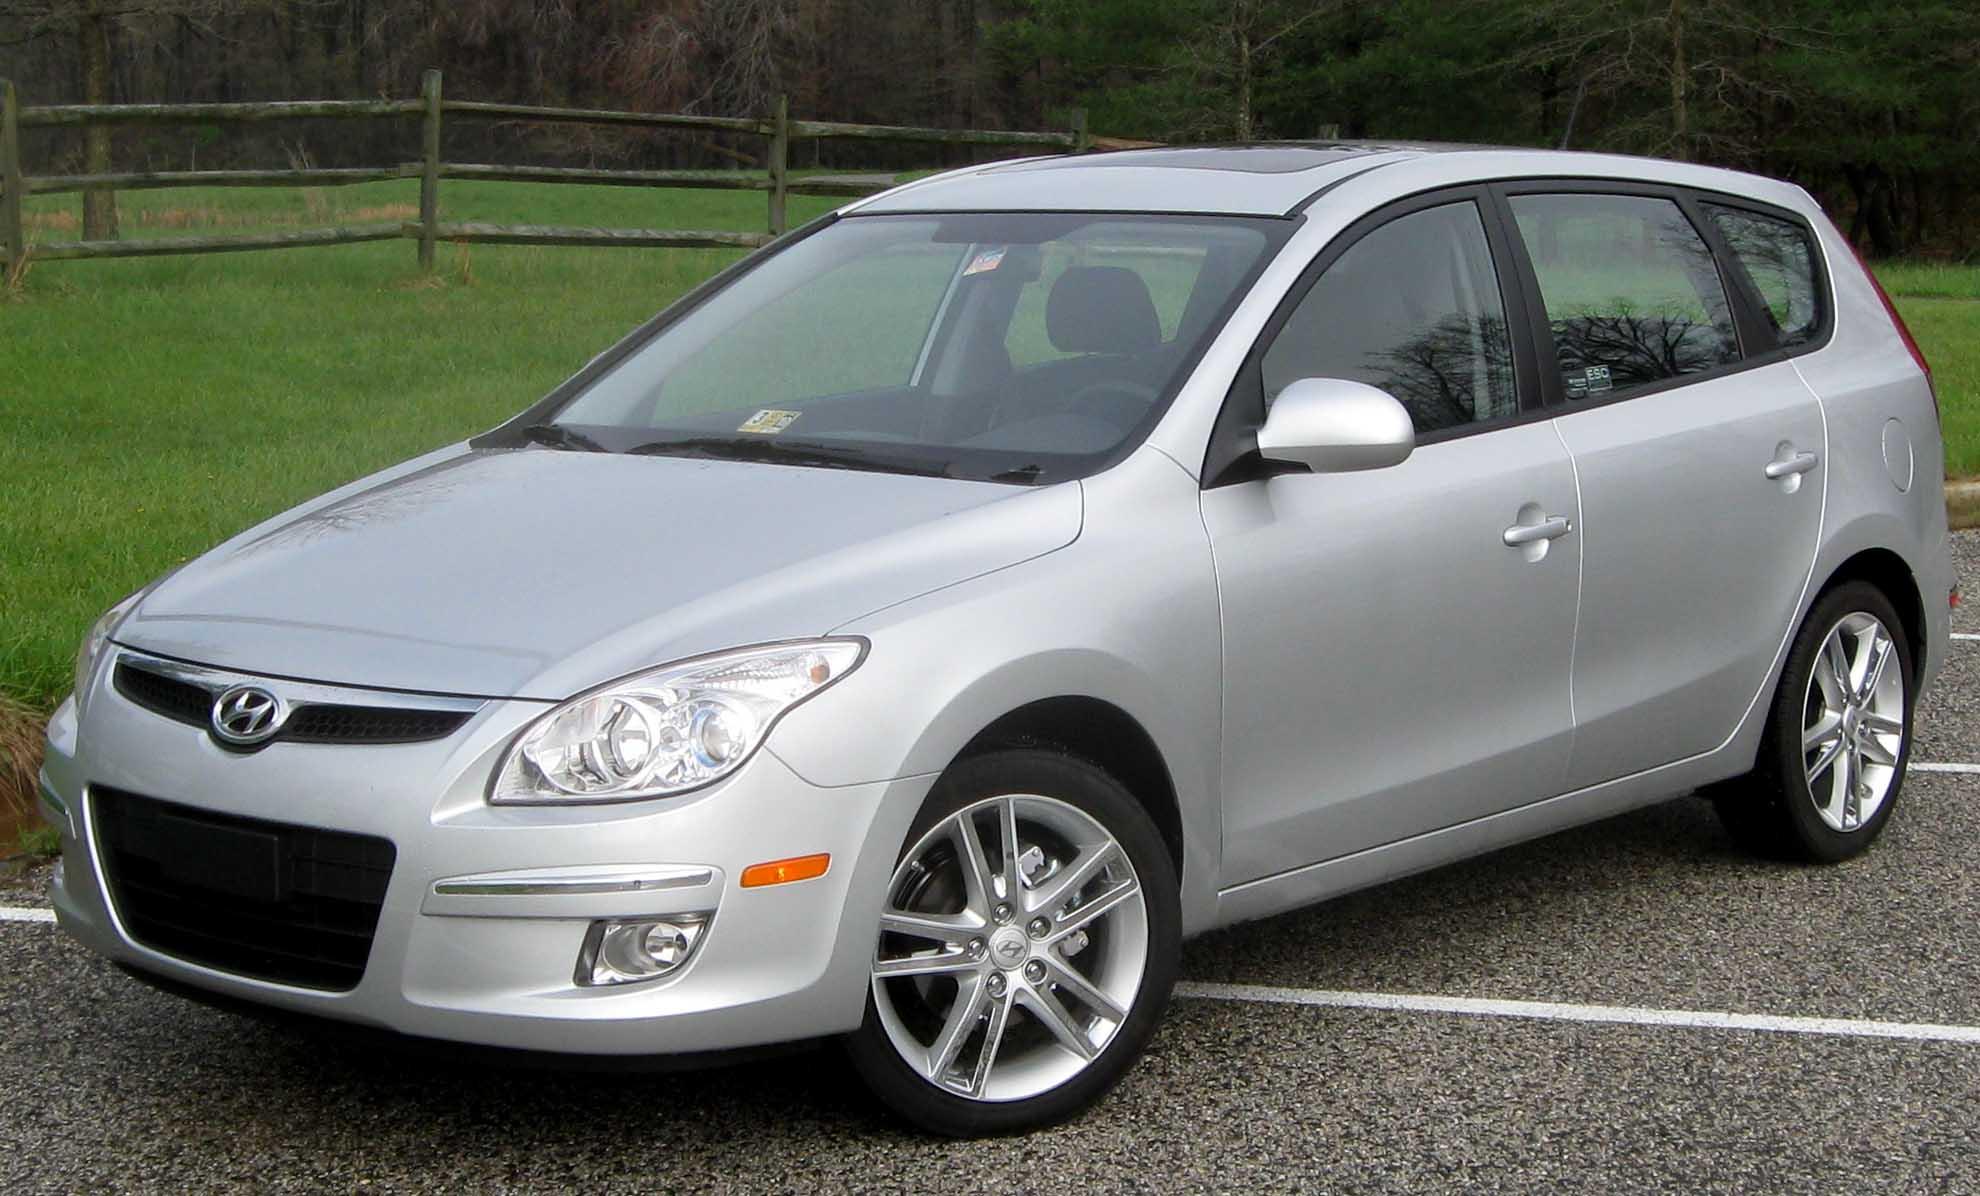 Hyundai Elantra Touring Price